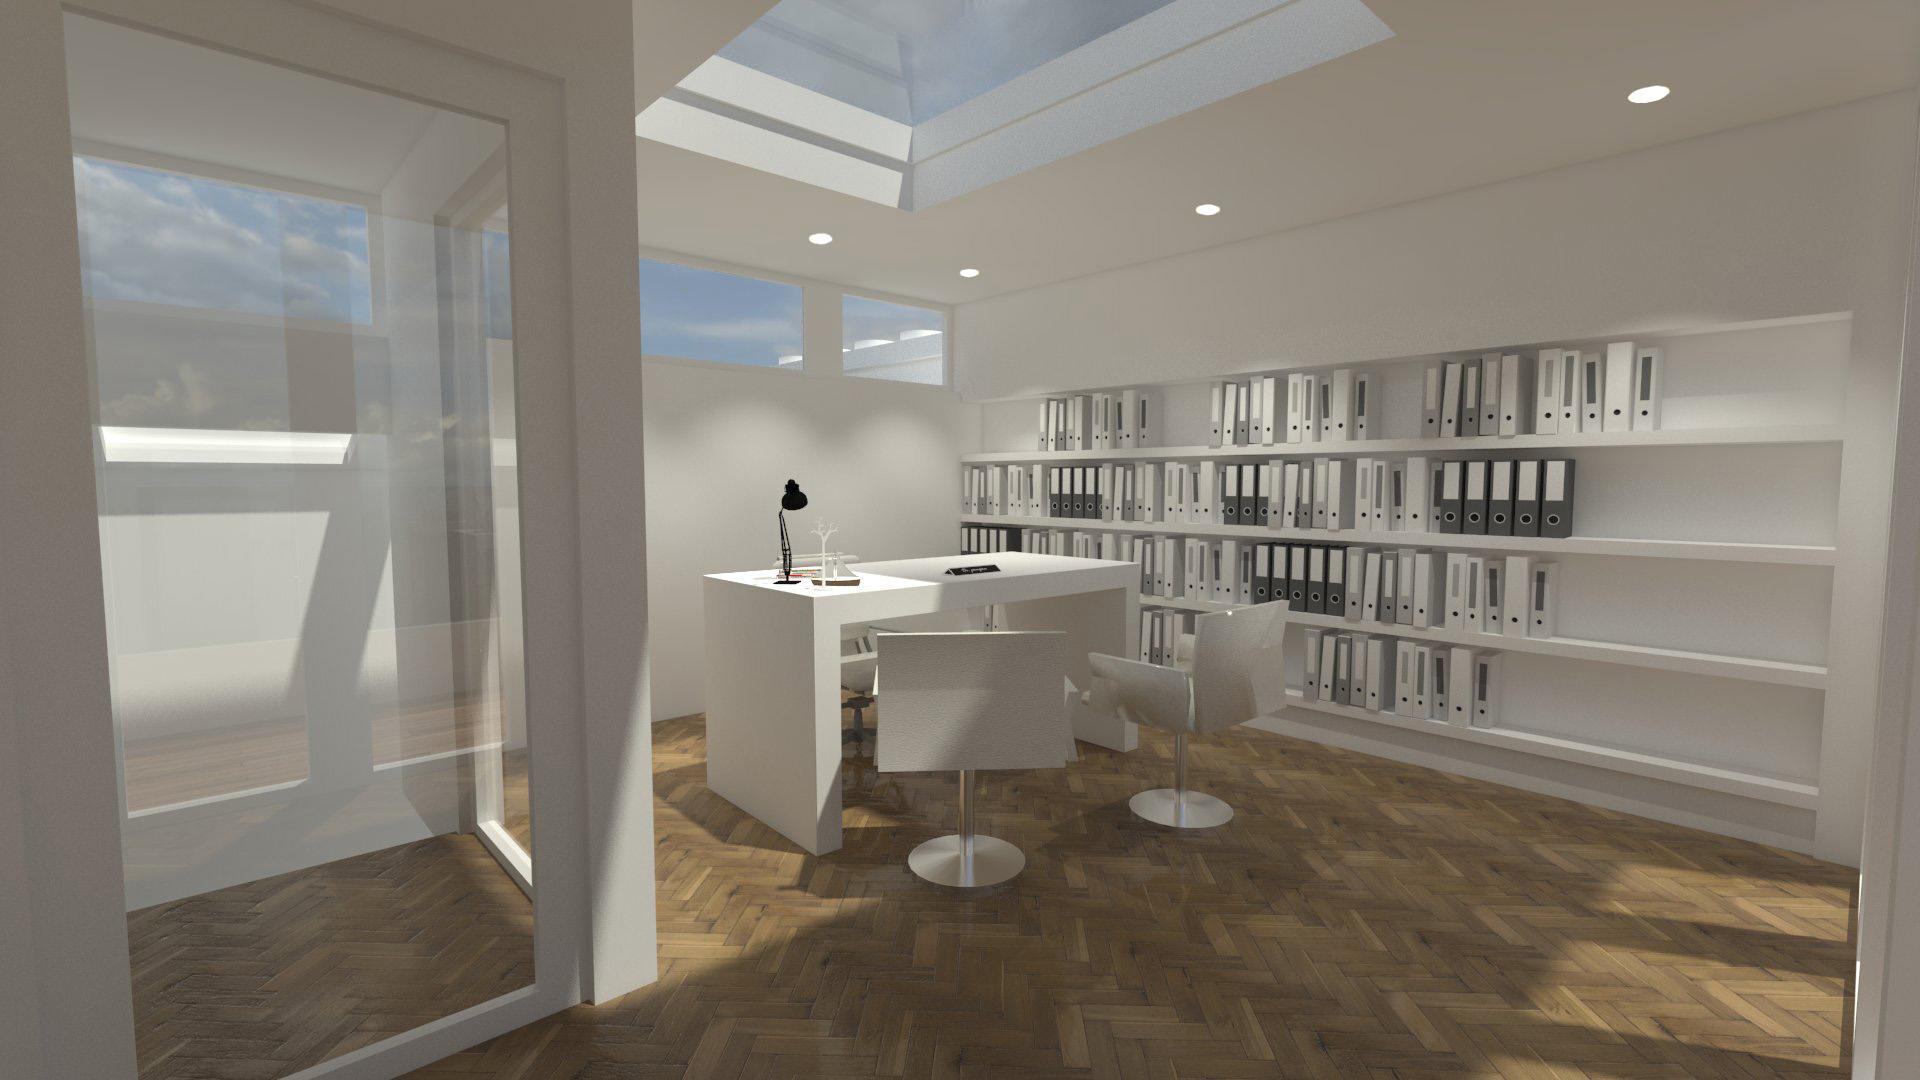 Fleet Street Office Roof Extension    Location:  Fleet Street    Floor Area:  40m2   Budget:  £200,000   Client:  Not disclosed   View More